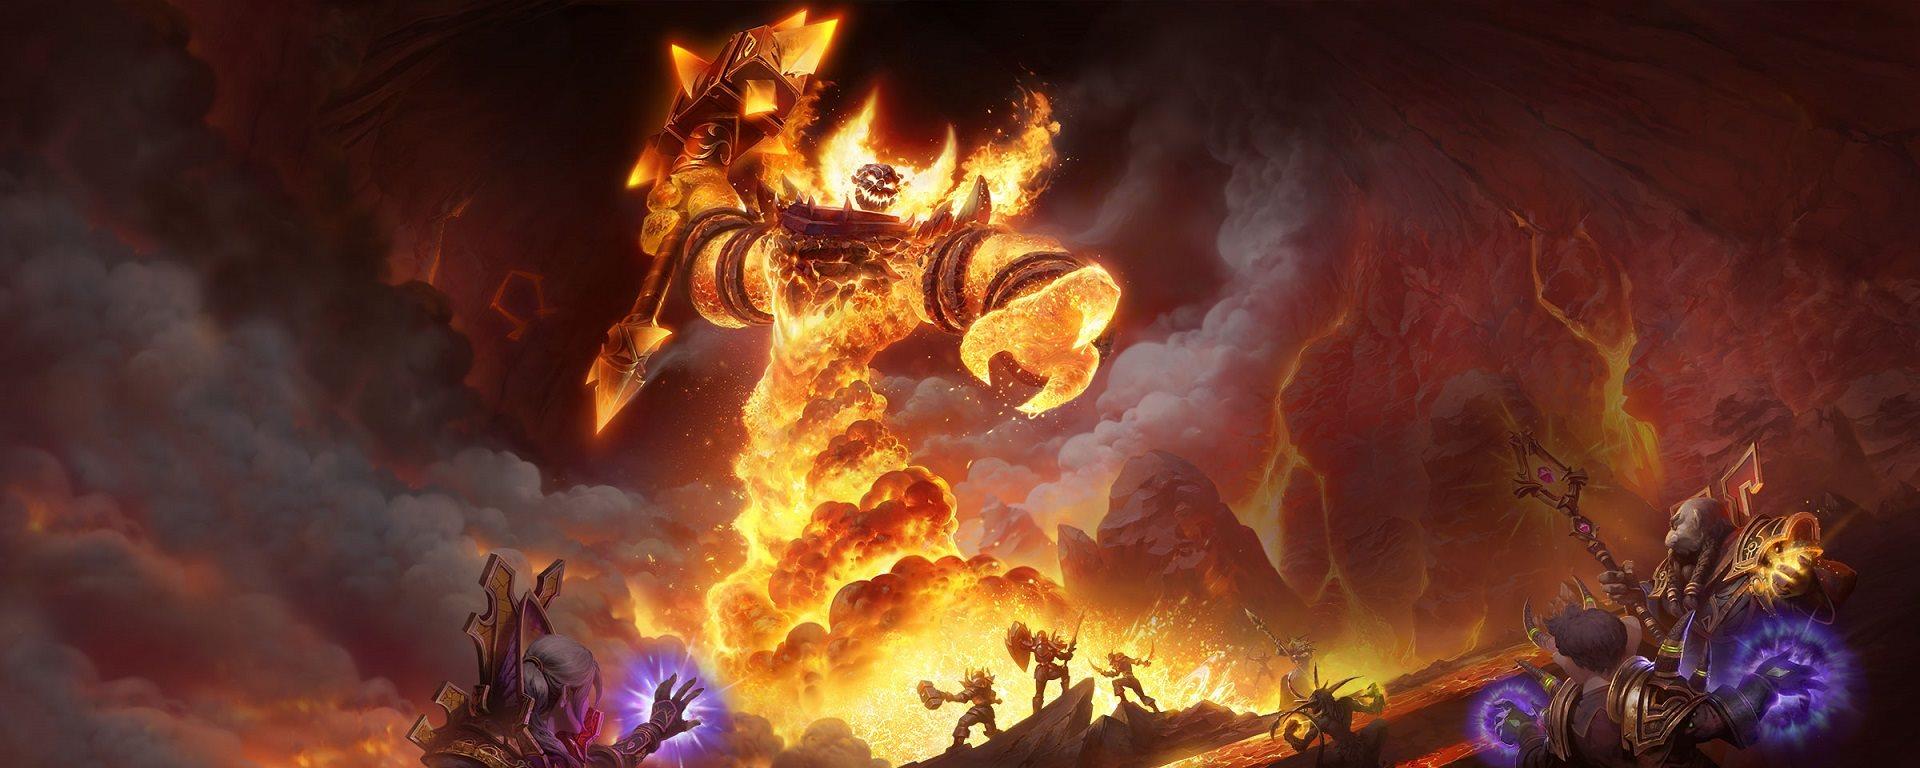 World of Warcraft Classic; wallpaper: classic